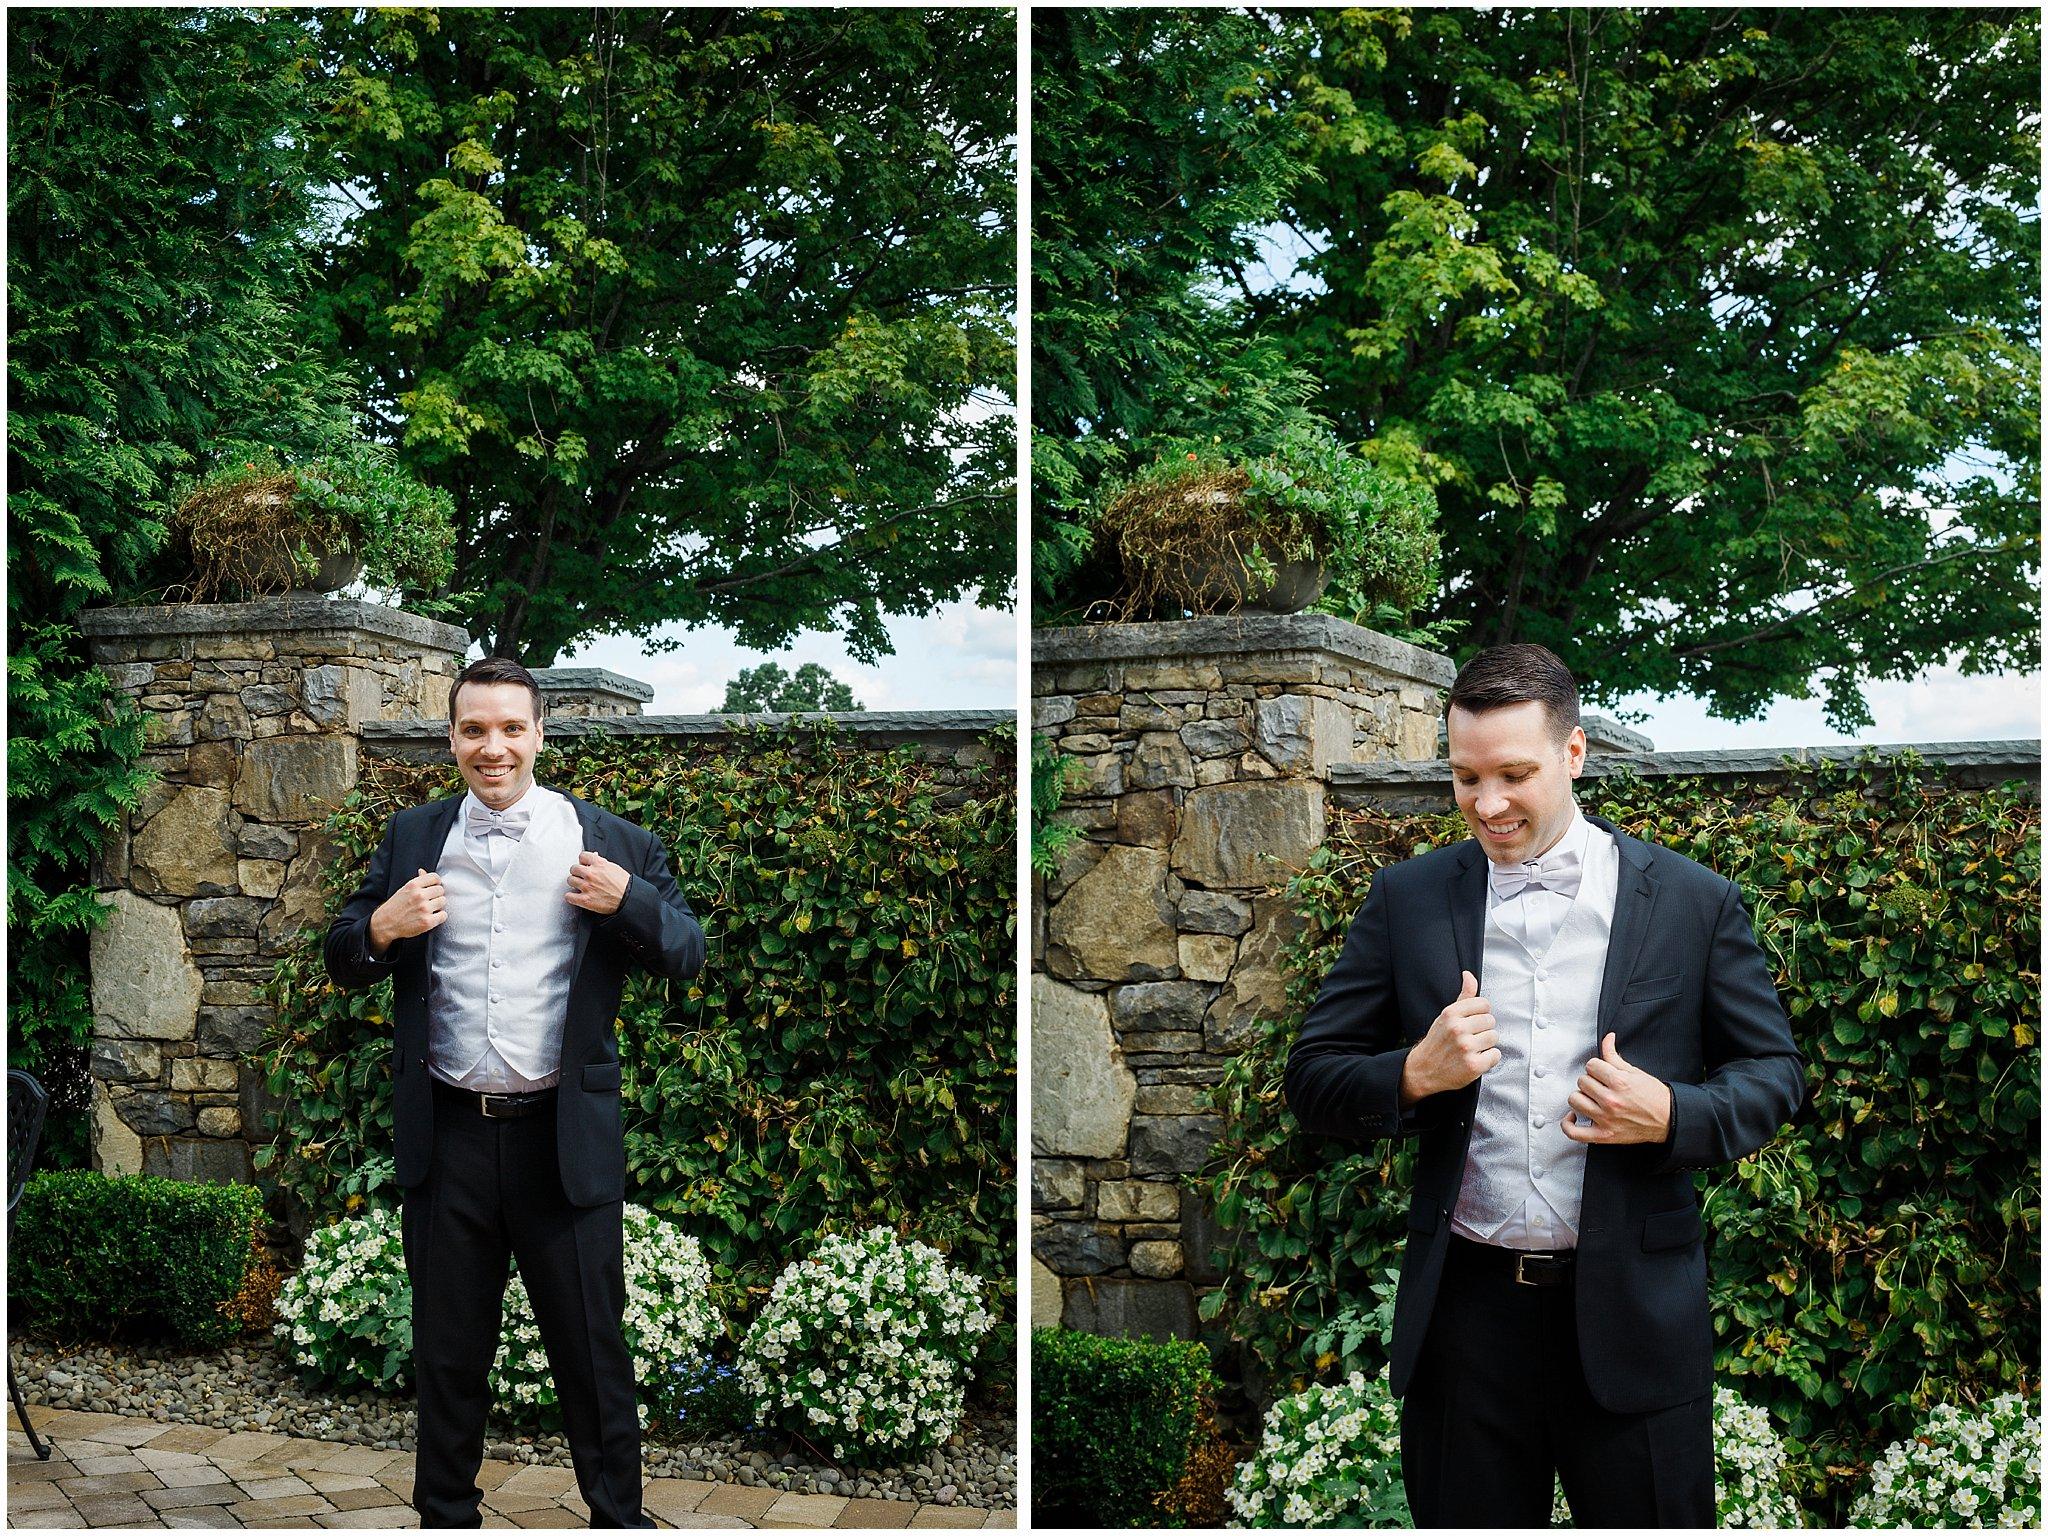 West Hills Country Club Wedding Gatsby Wedding Roaring Twenties Wedding Hudson Valley Wedding Photographer Sweet Alice Photography12.jpg